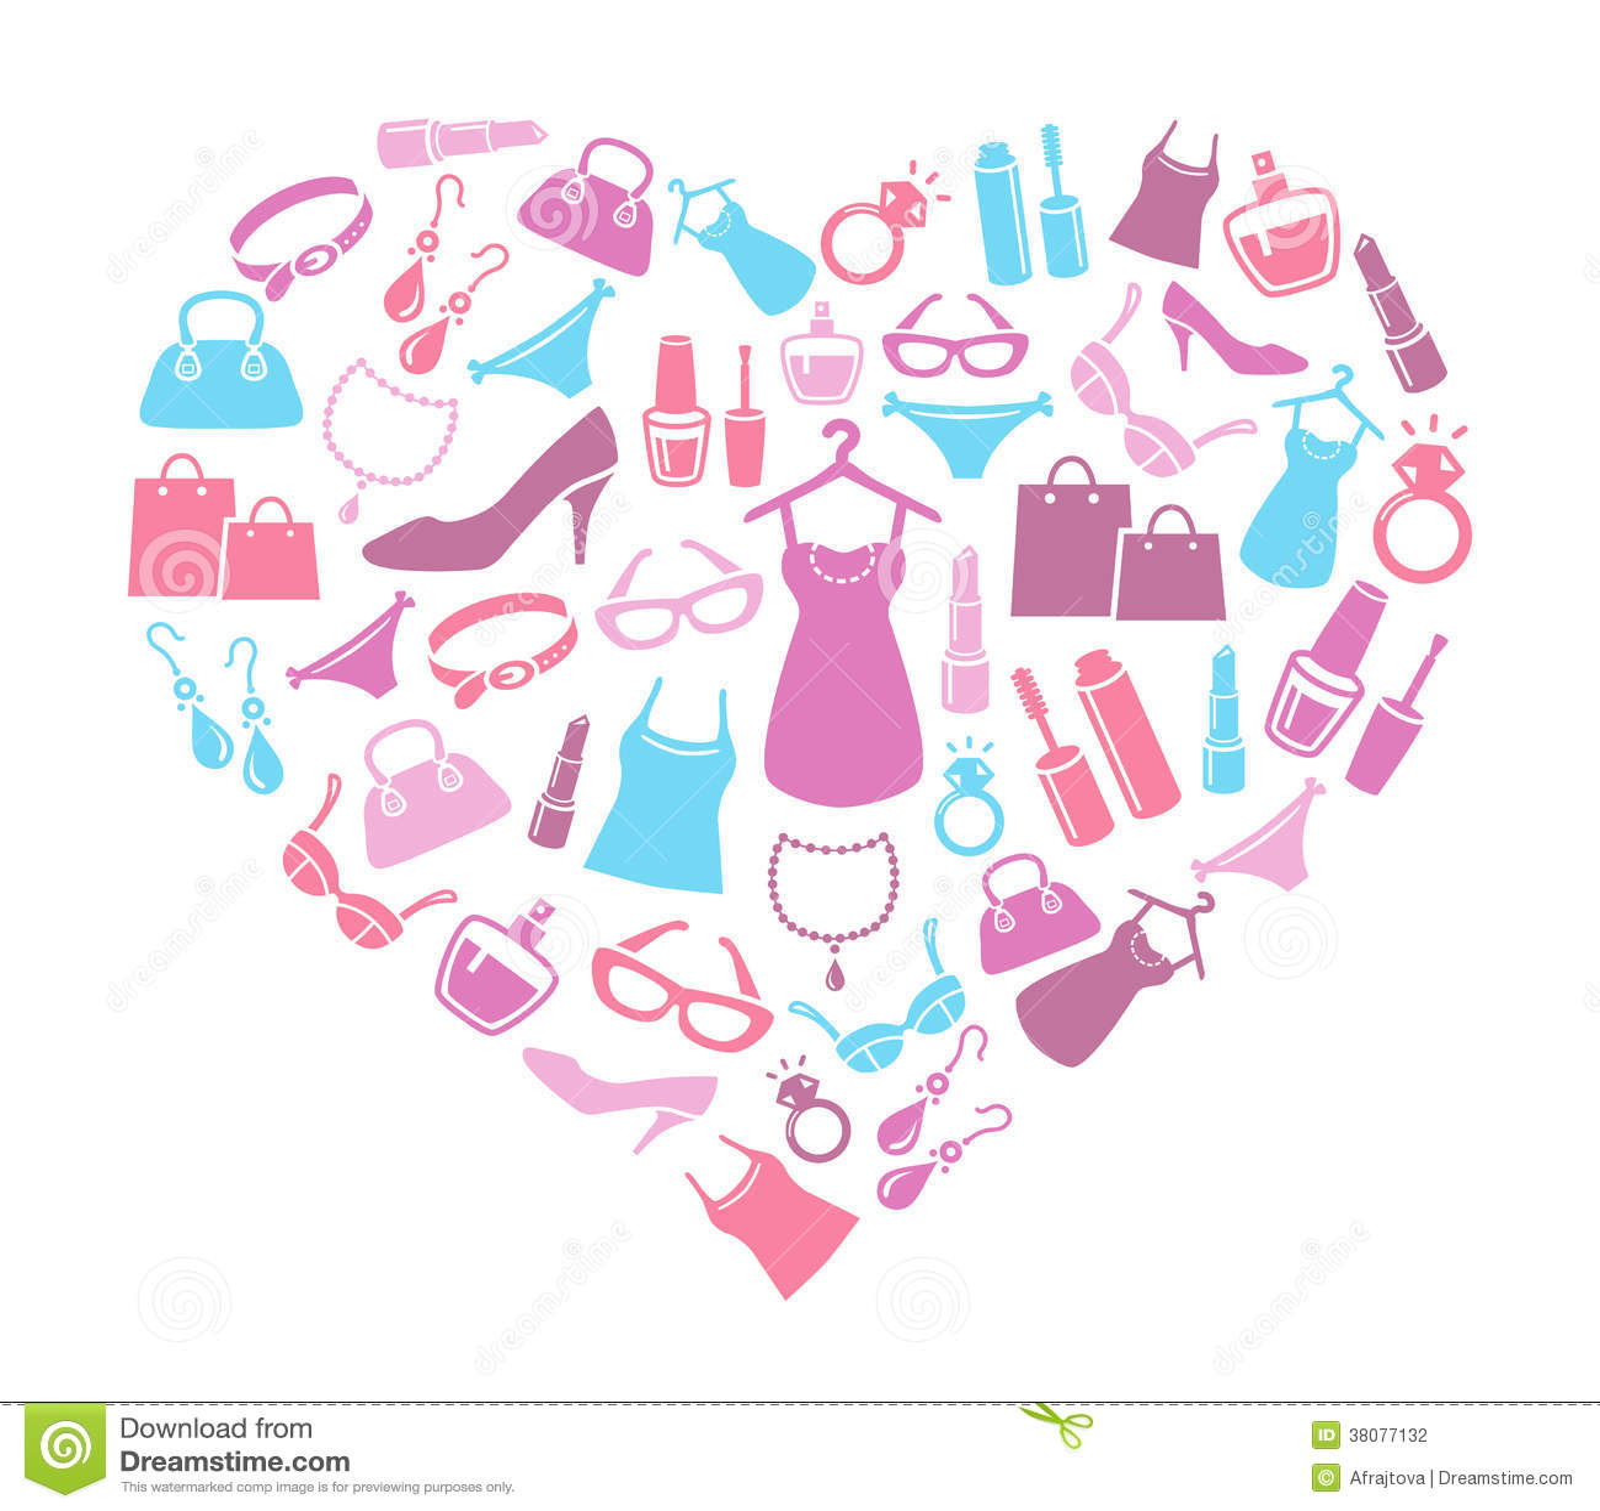 Women Love Shopping Stock Photography